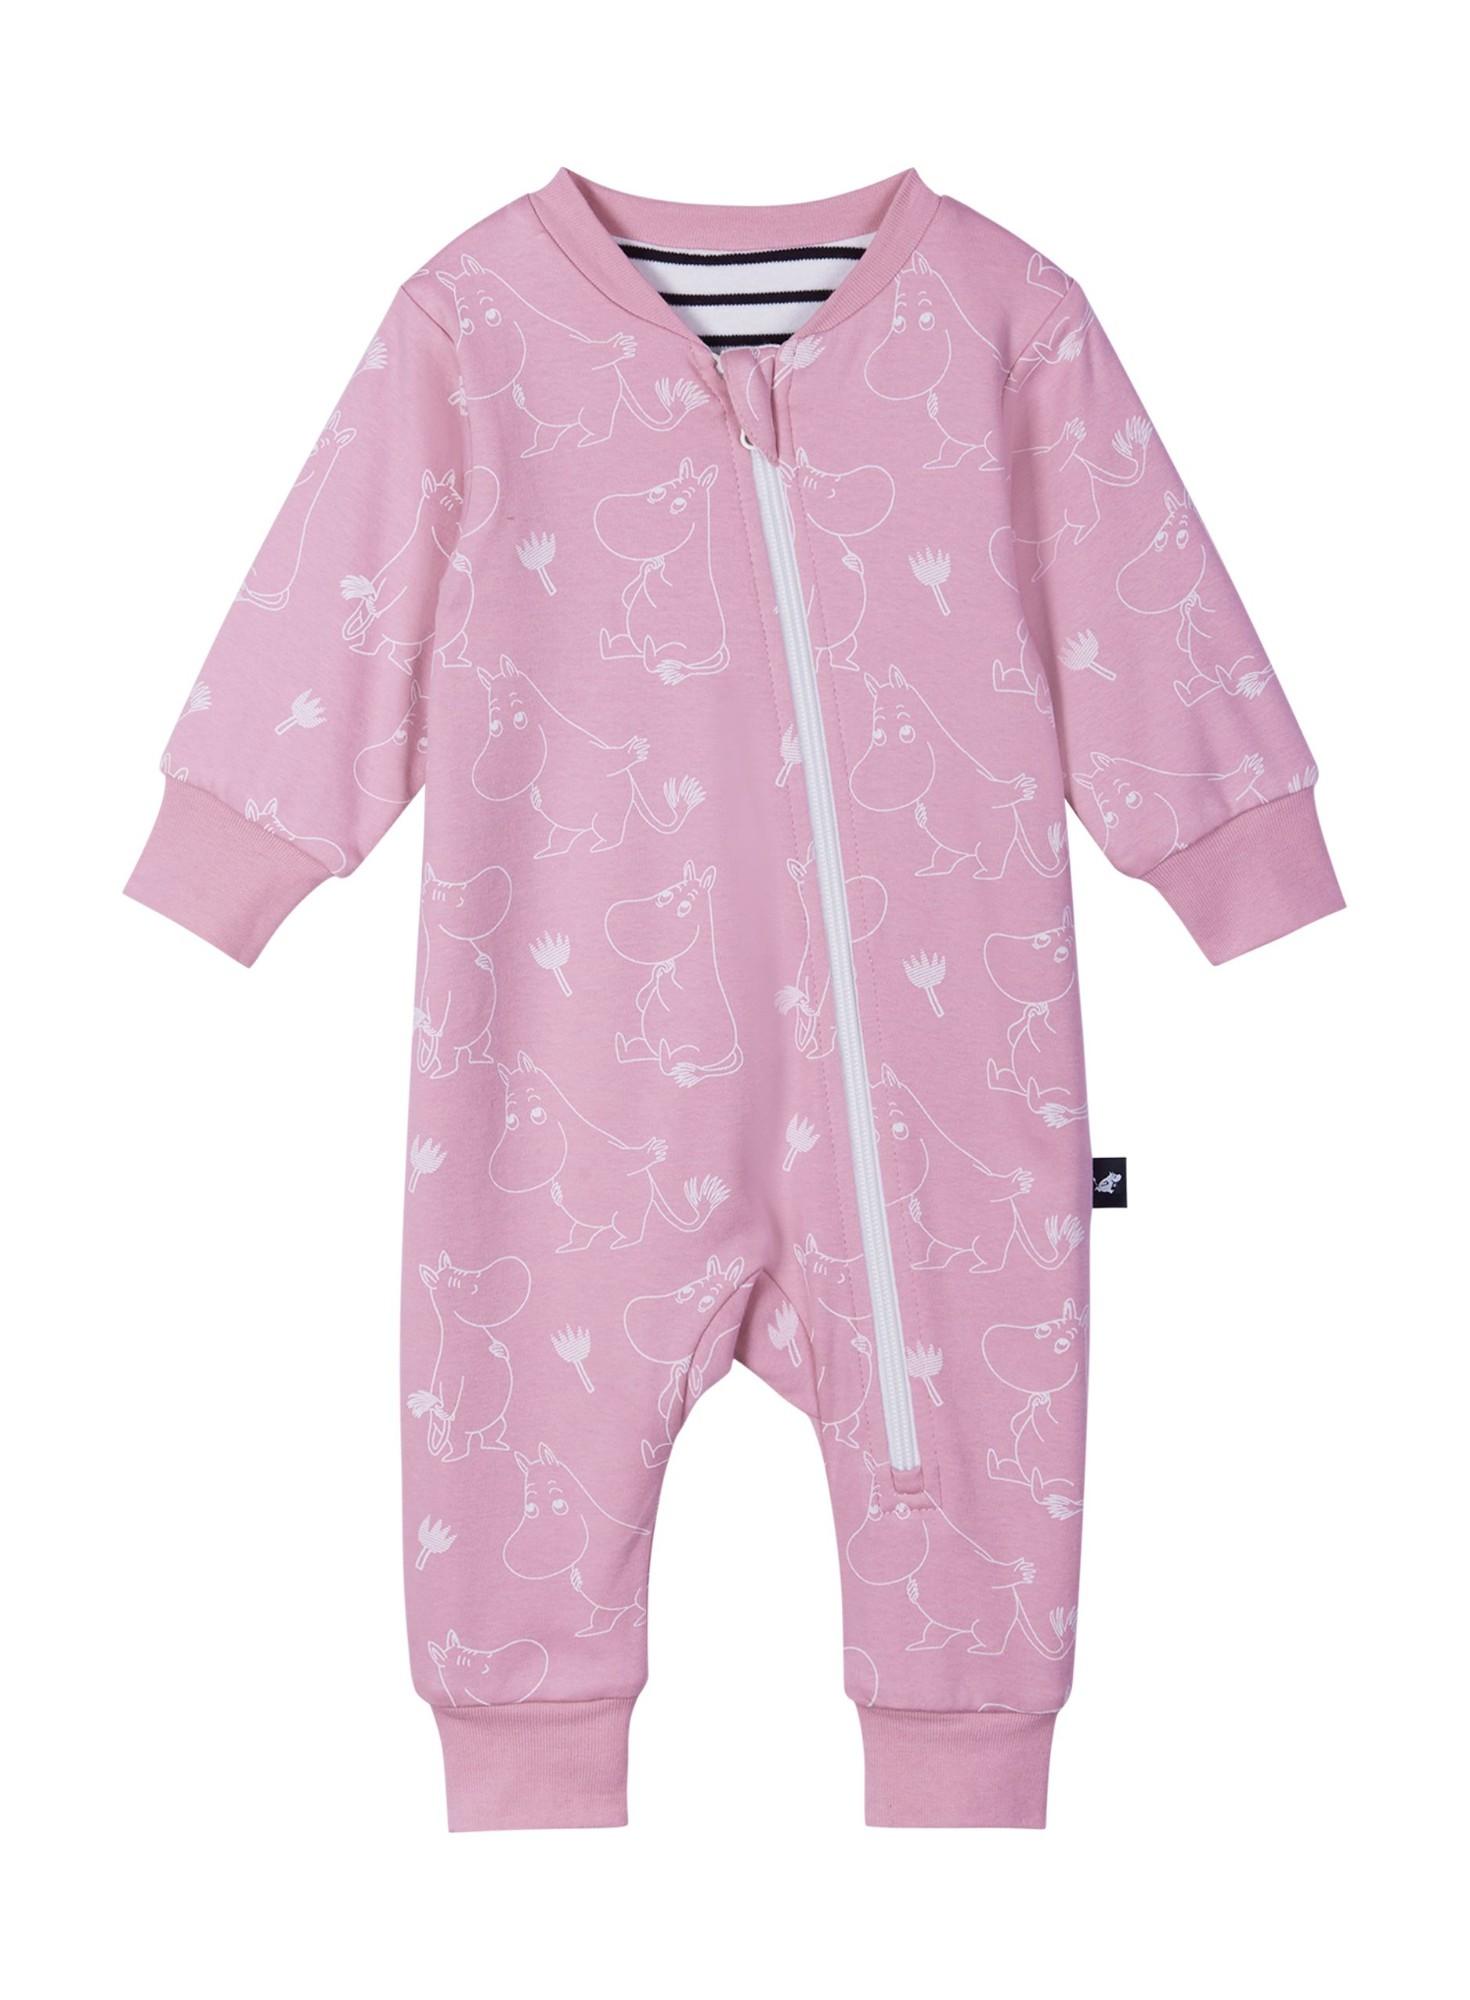 REIMA Moomin Sovare Rosy Pink 50-56